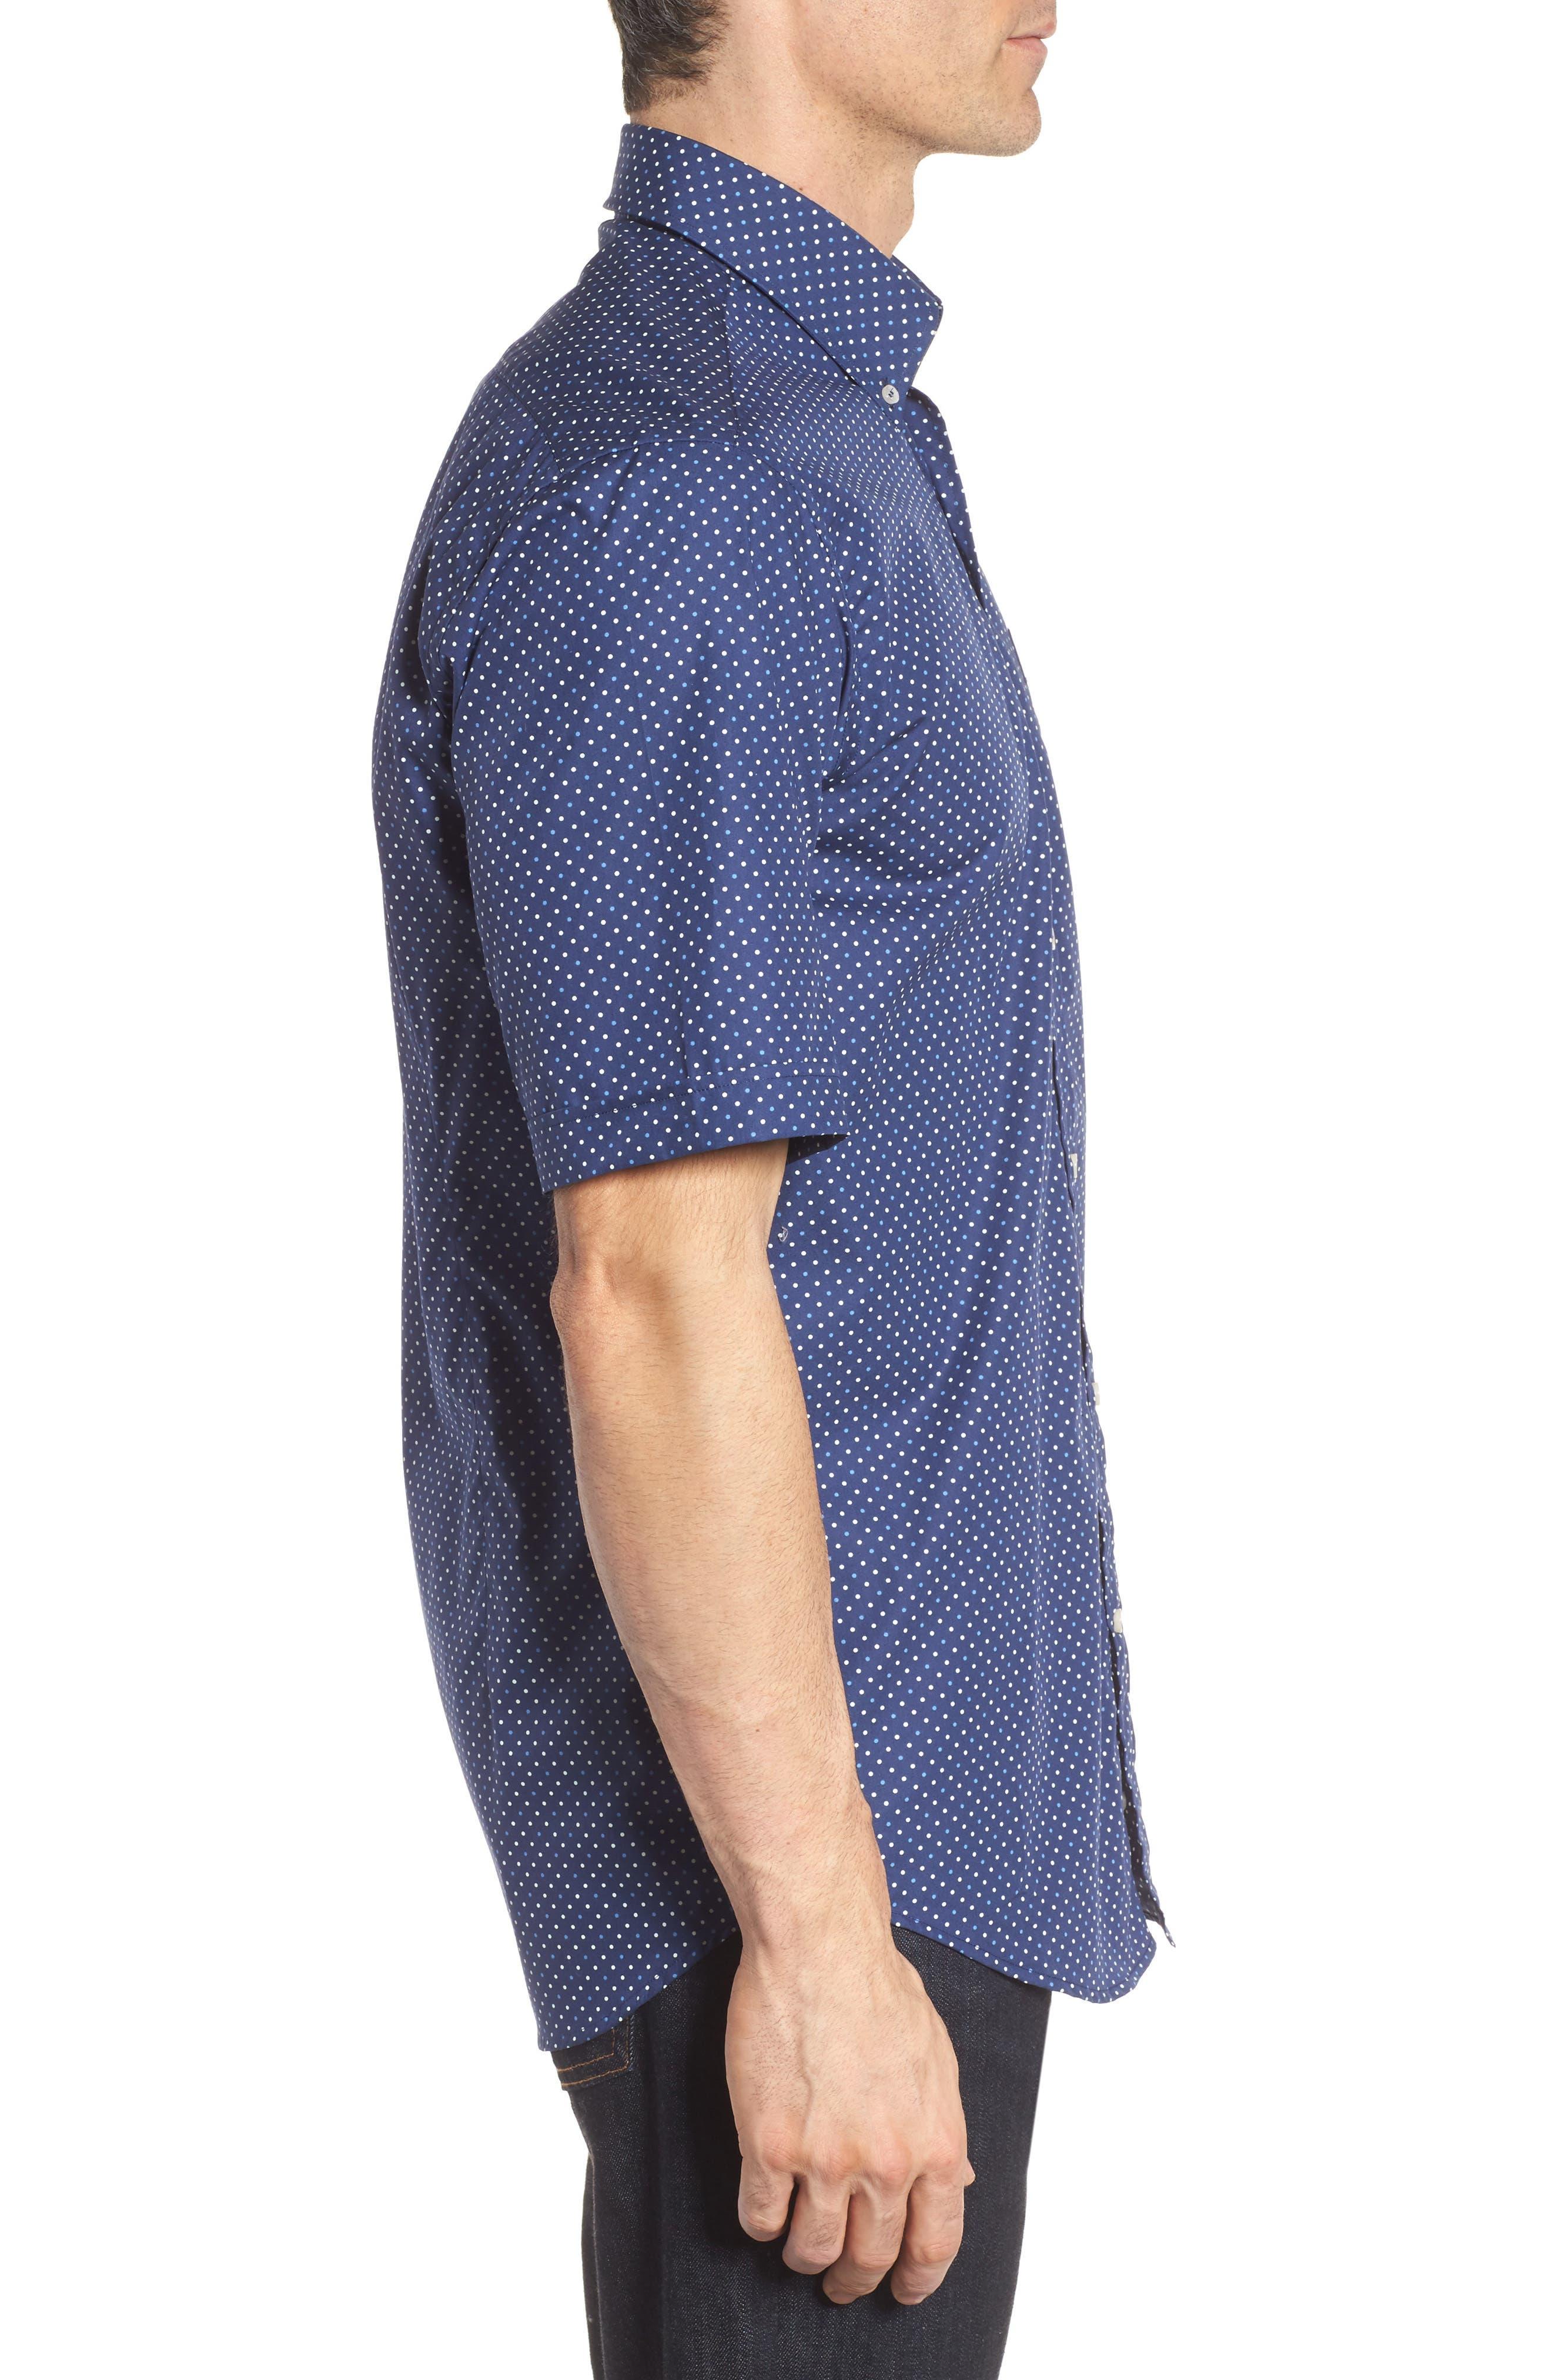 Paul&Shark Dot Sport Shirt,                             Alternate thumbnail 3, color,                             407